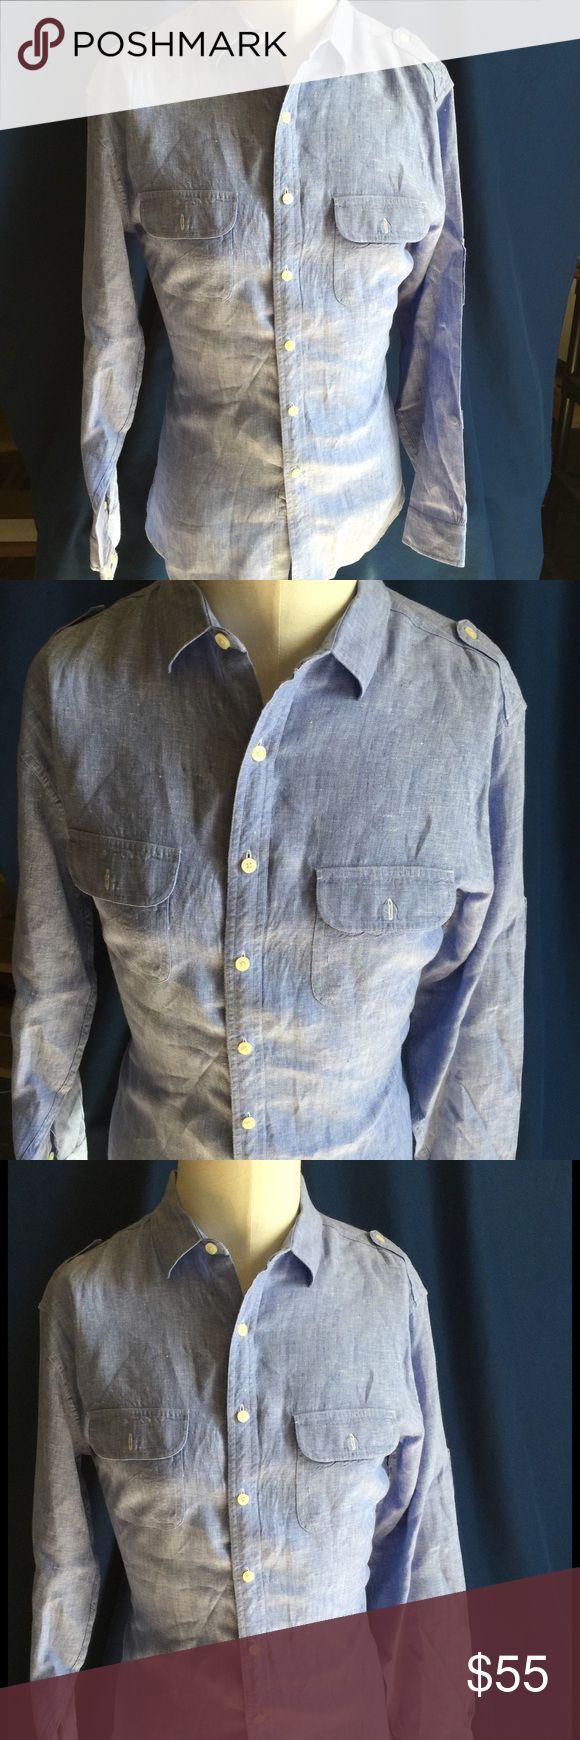 Nw Brooks Brothers size M New Brooks Brothers Shirts Dress Shirts